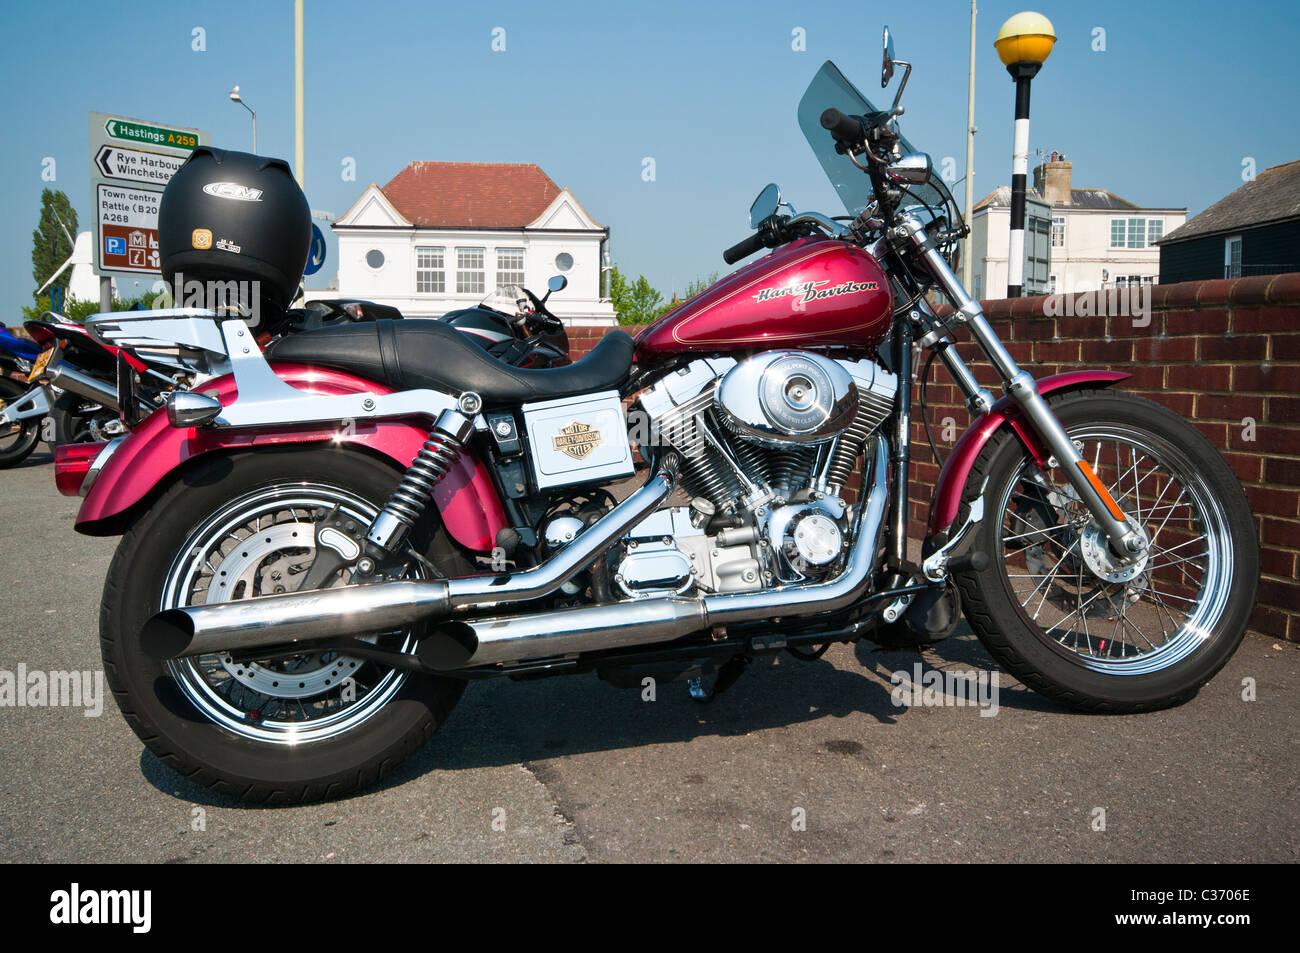 A Harley Davidson Motorcycle - Stock Image